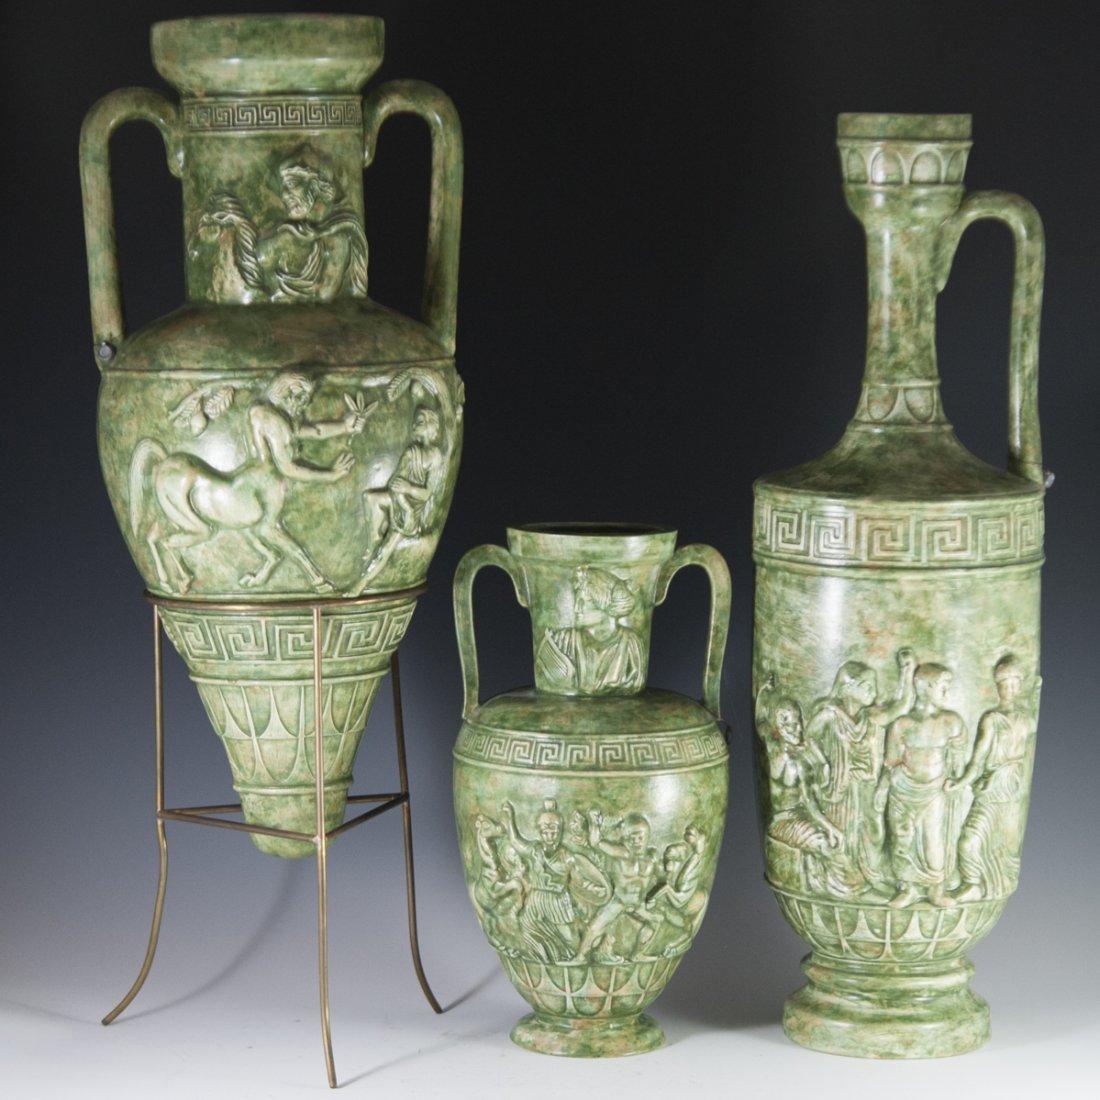 Handmade Greek Classic Period Pottery Replicas